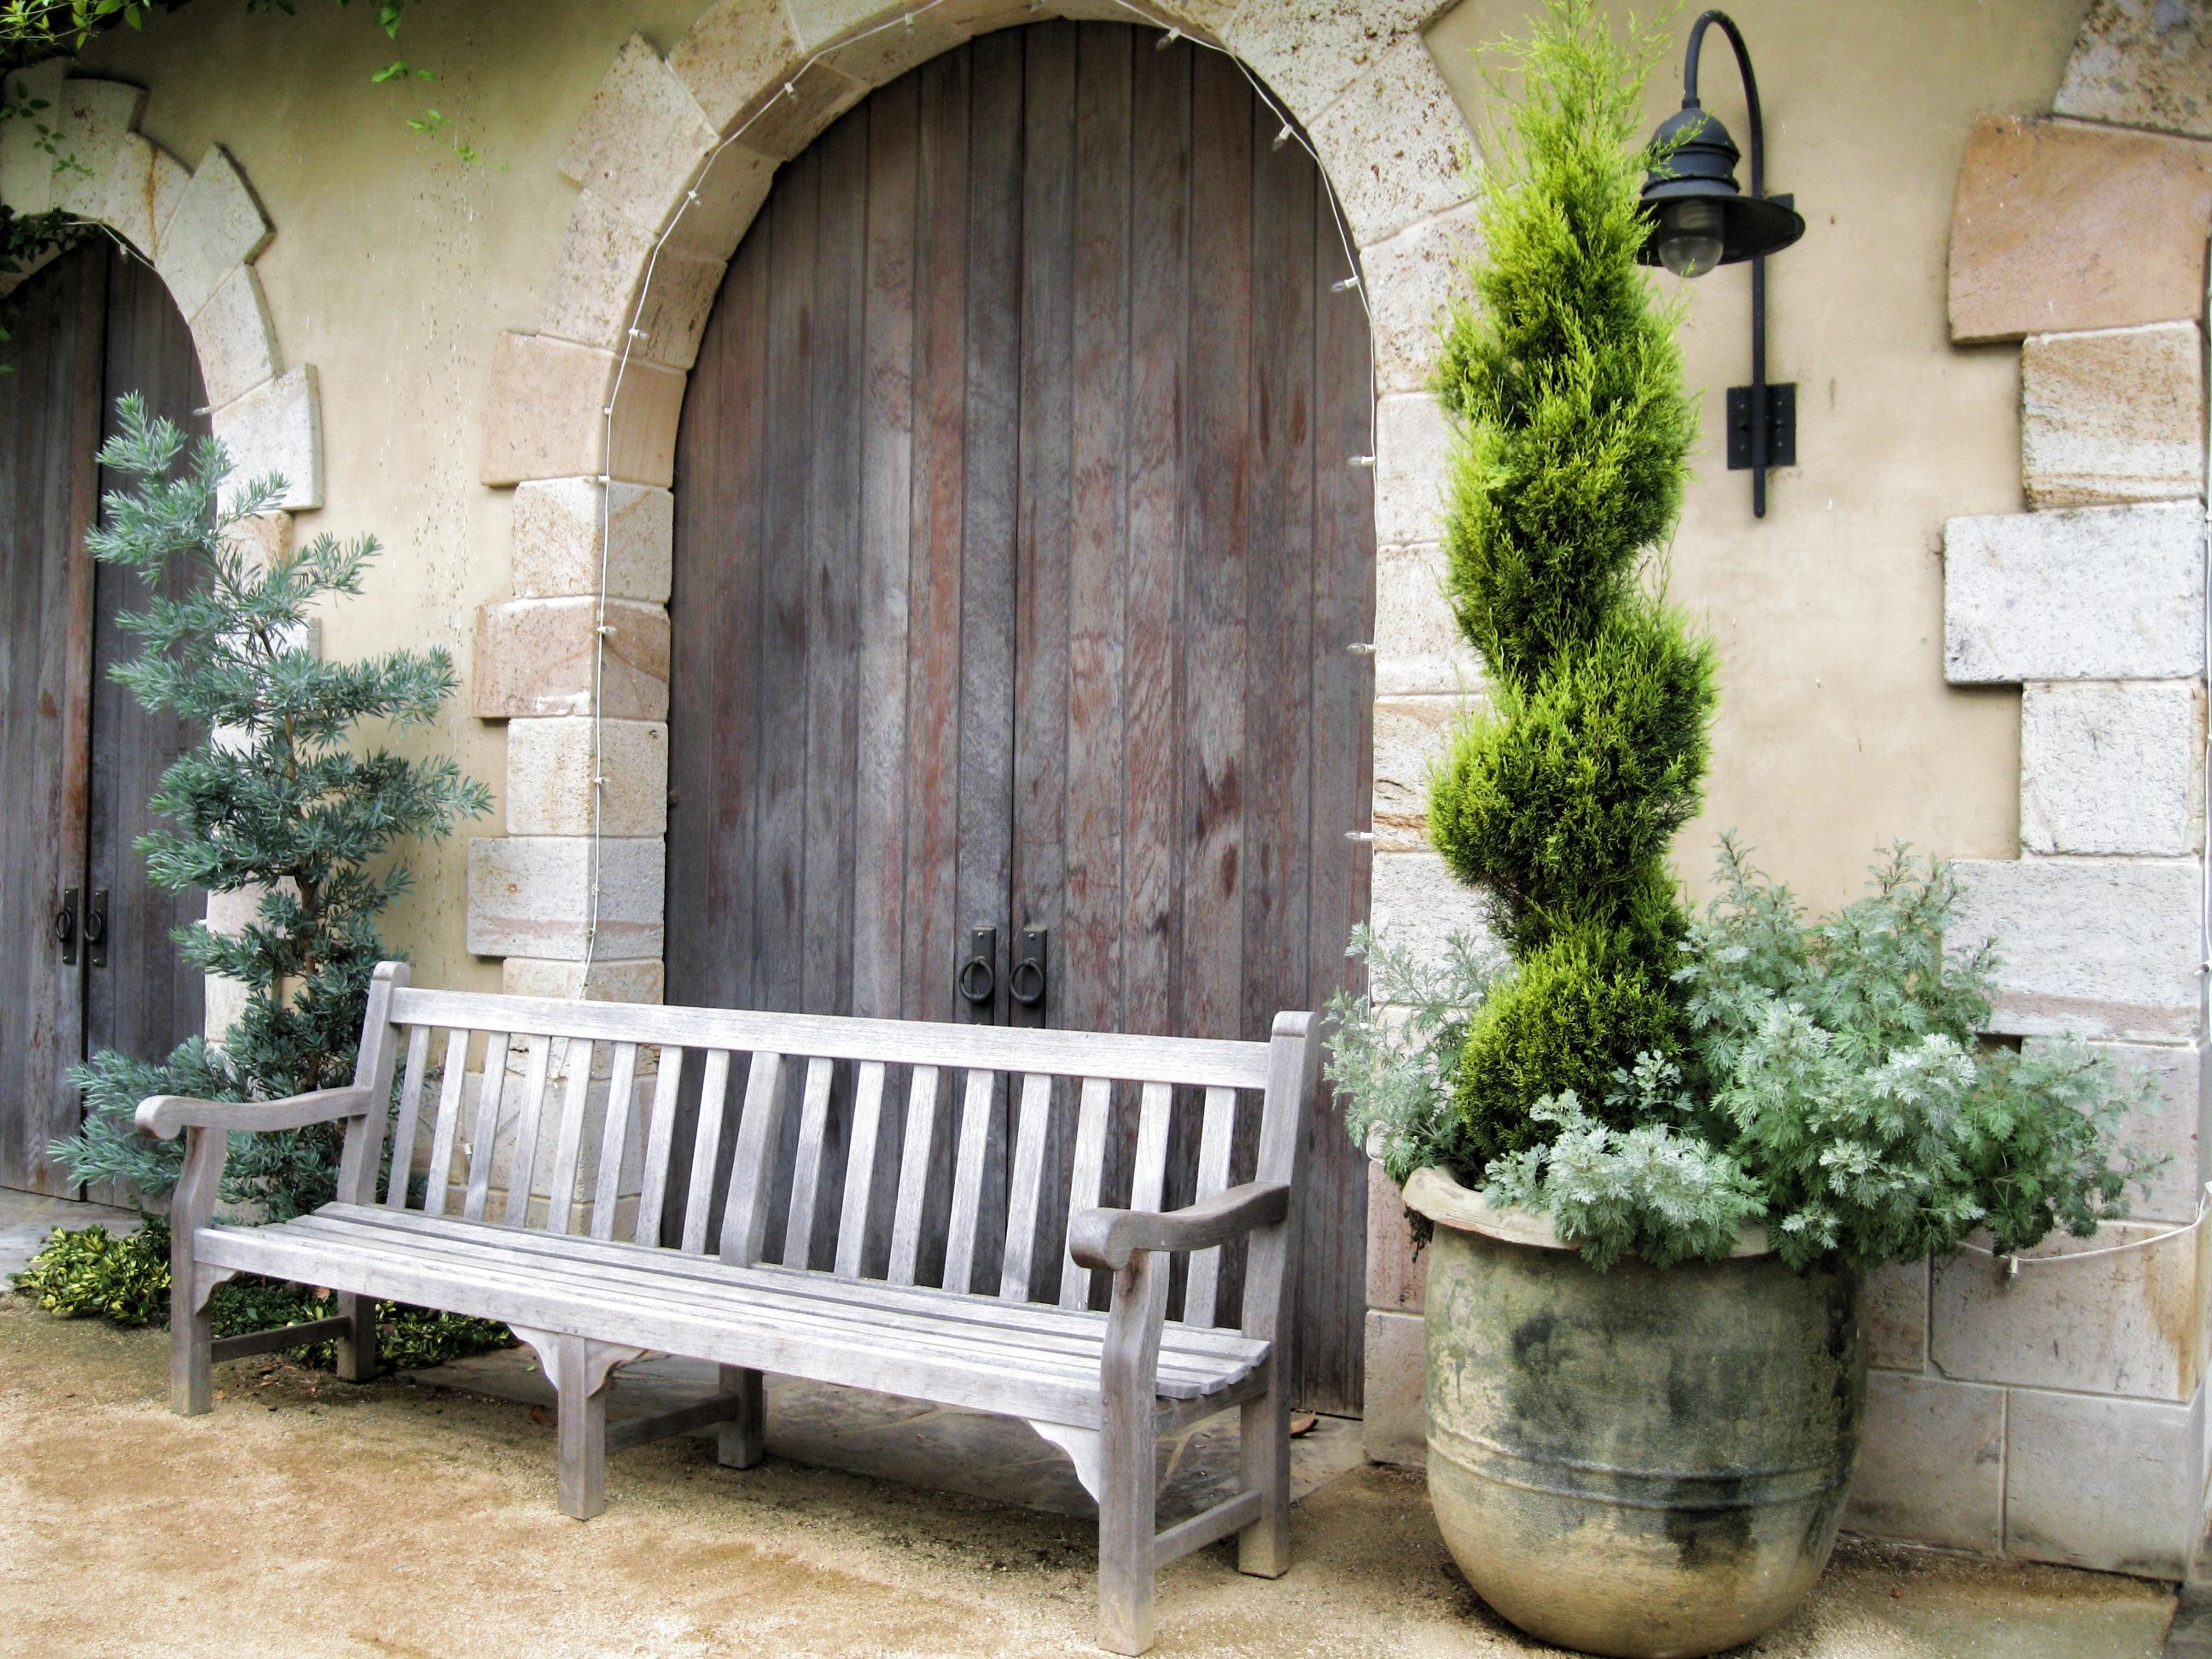 Fotos gratis al aire libre ventana casa pared porche for Jardin al aire libre de madera deco